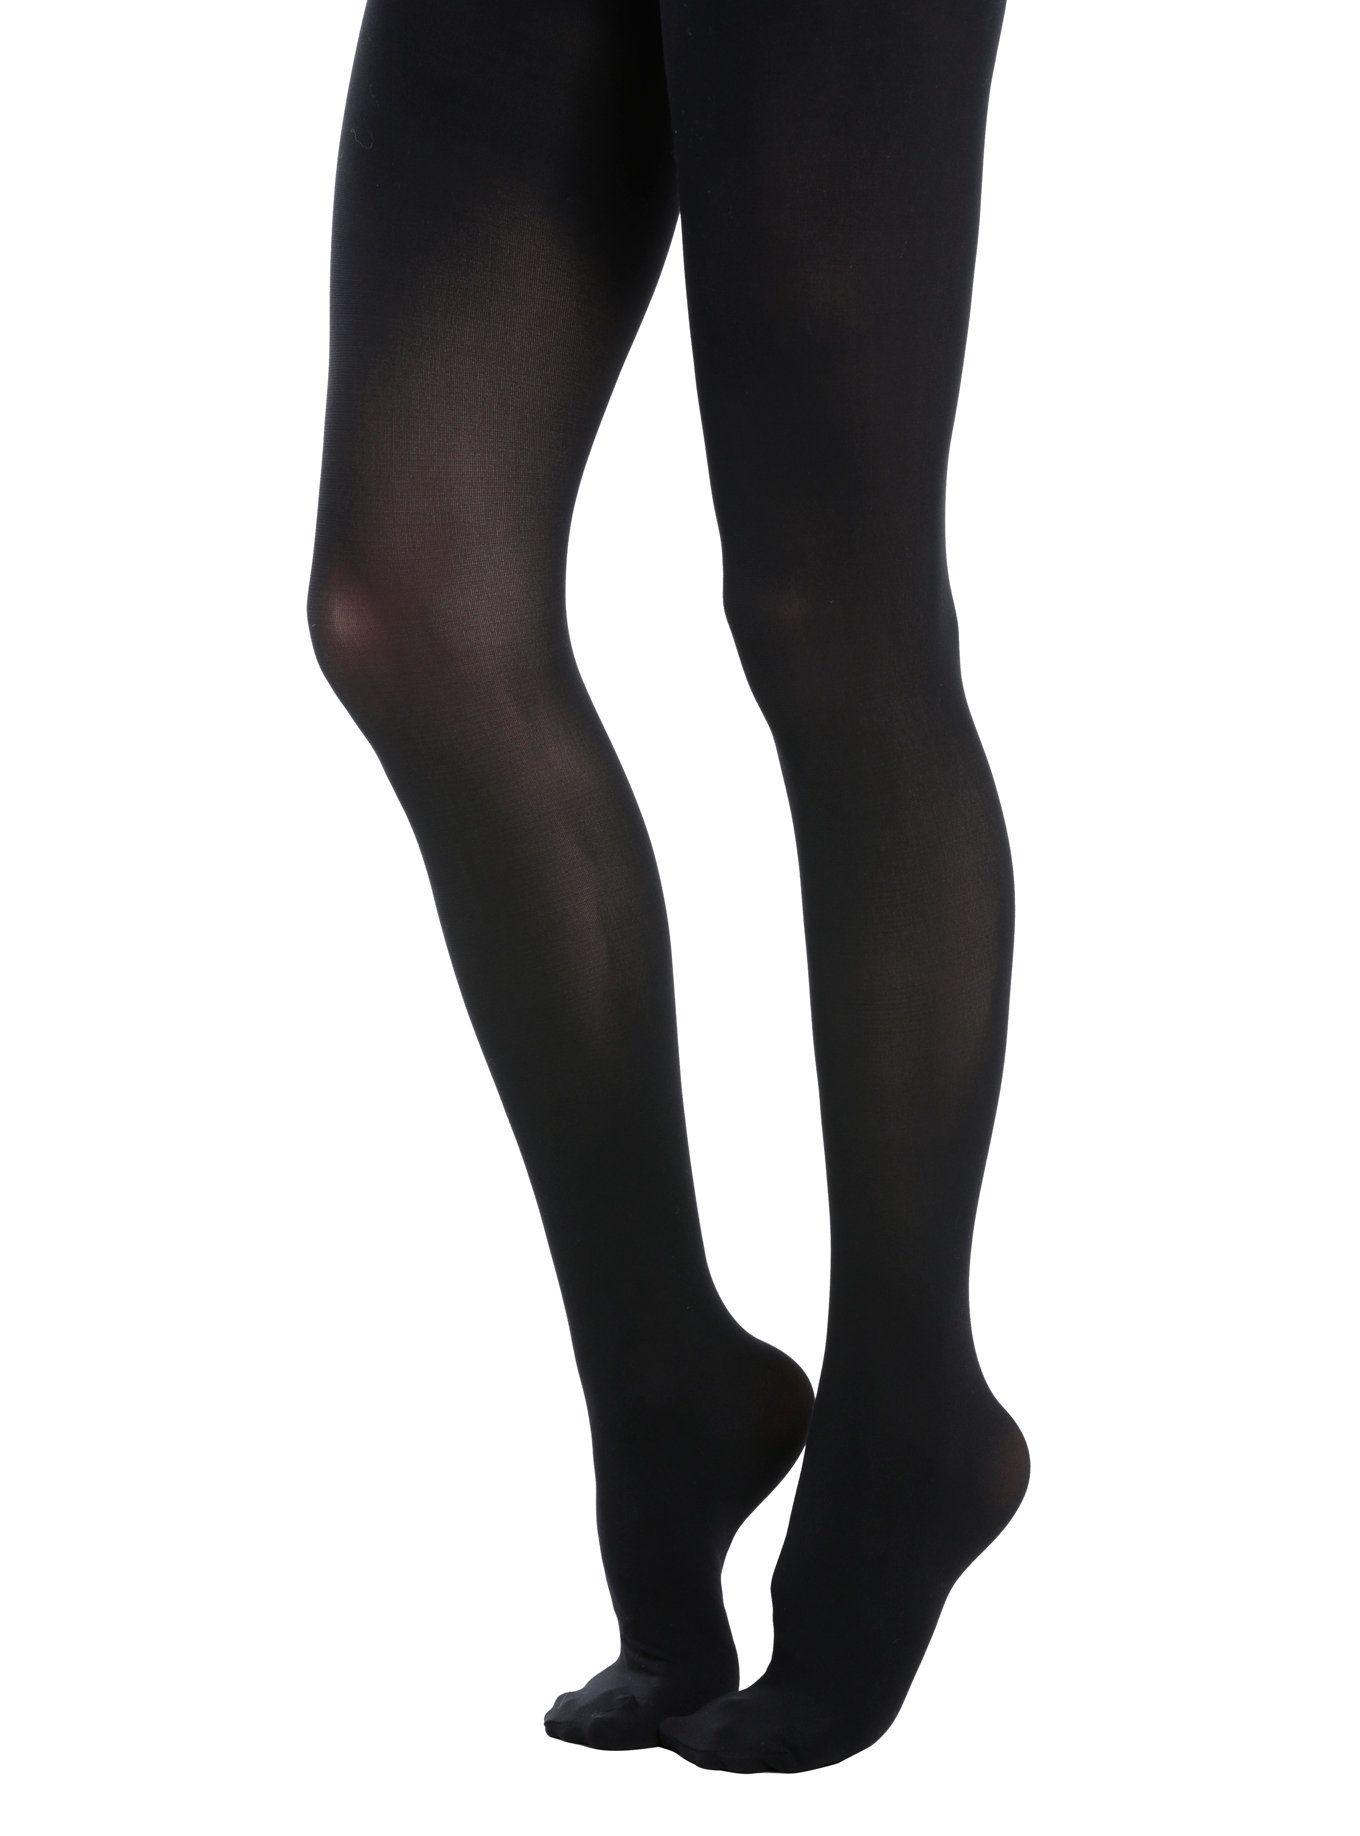 @instagram | Stockings, Stockings heels, Pantyhose